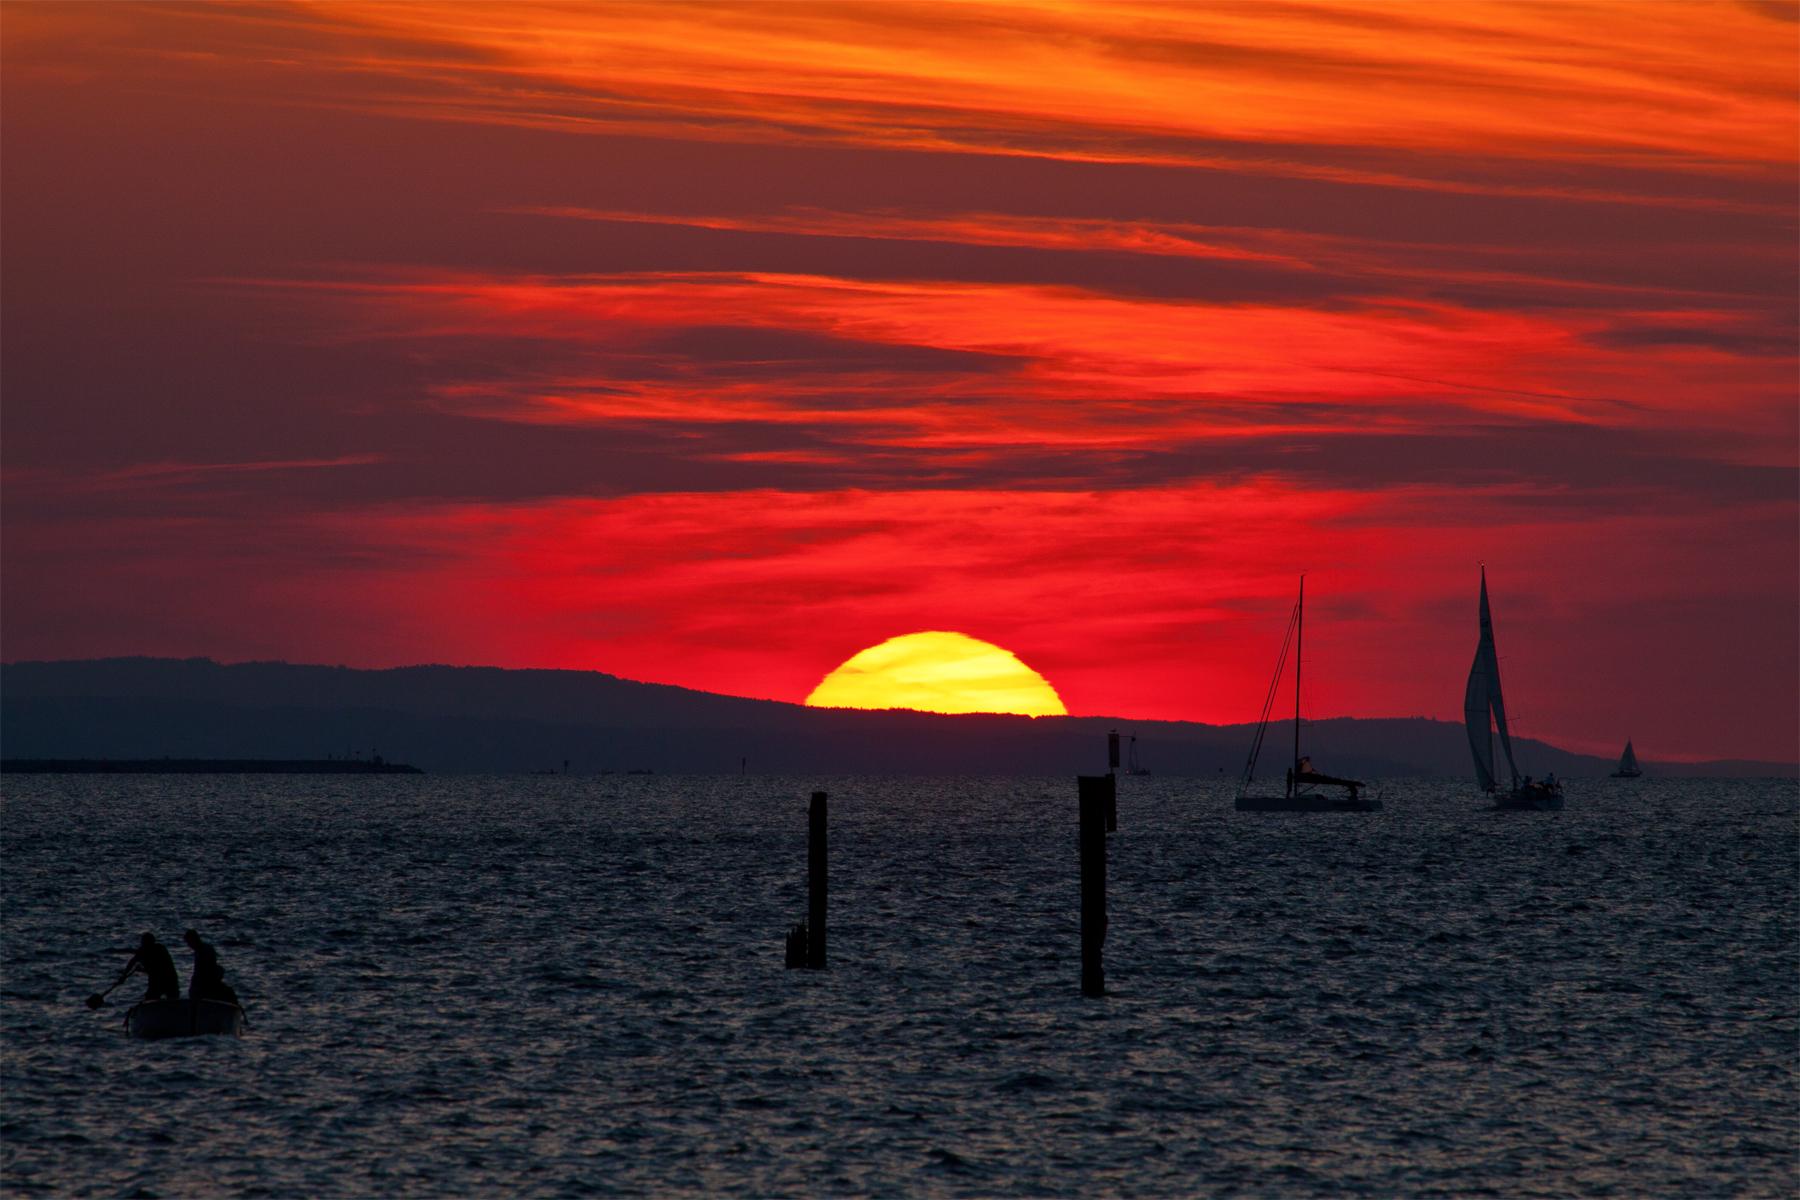 Leuchtende Segel im Sonnenuntergang